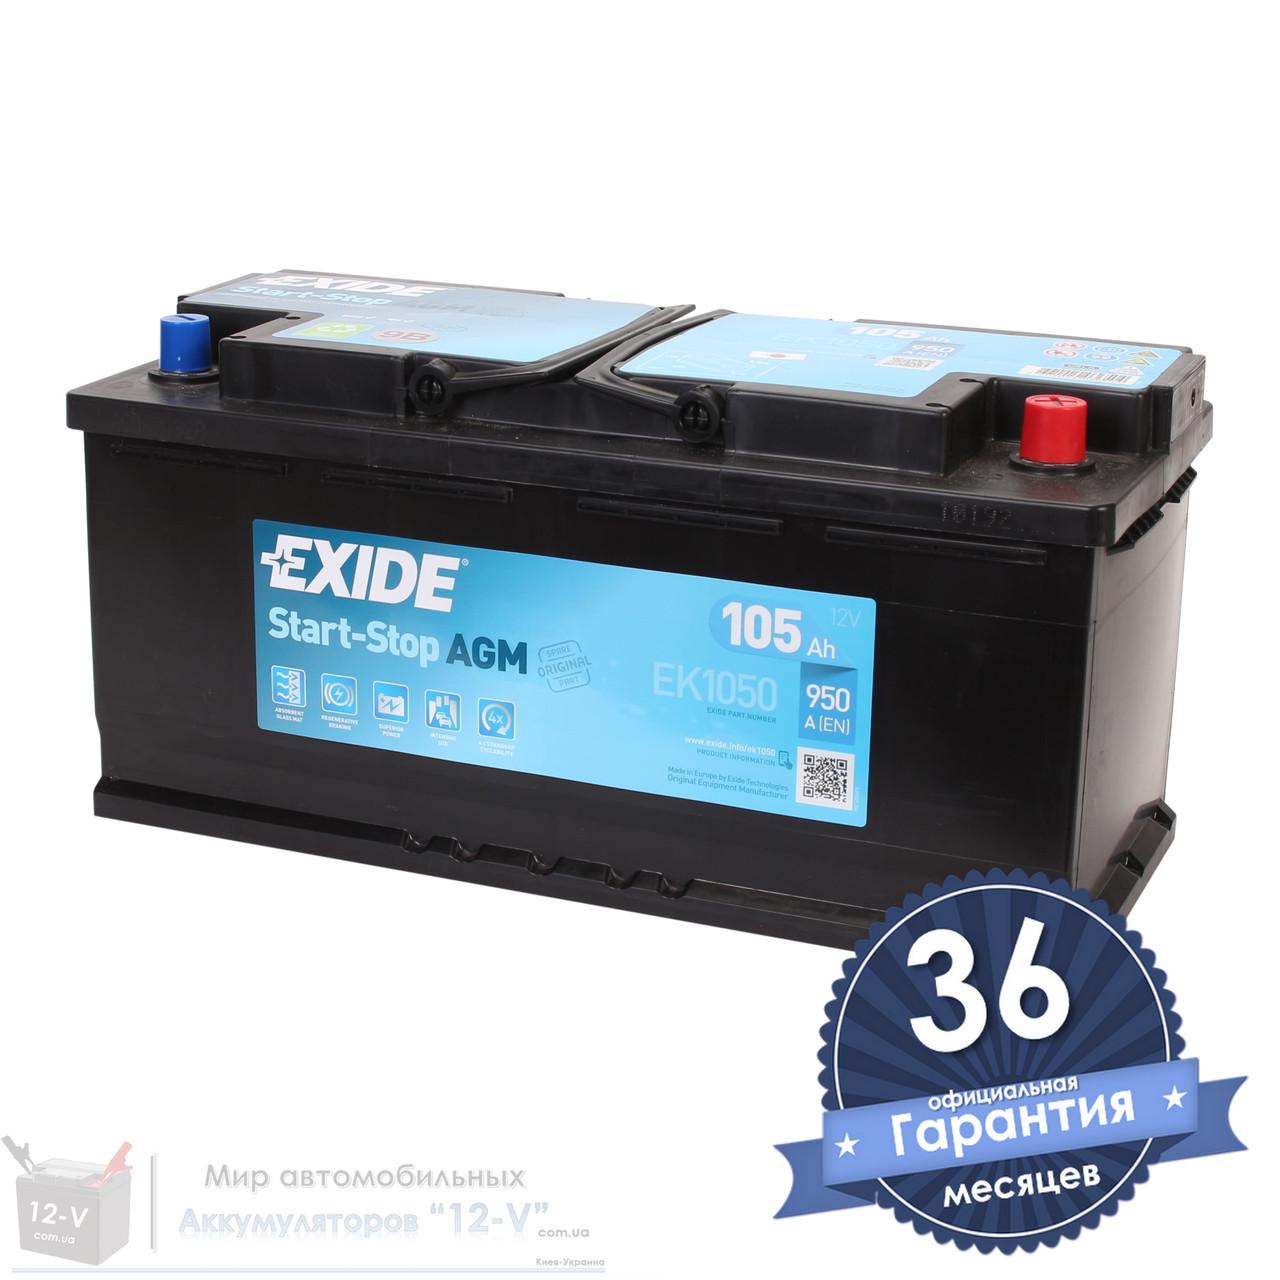 Аккумулятор автомобильный EXIDE AGM 6CT 105Ah, пусковой ток 950А [–|+] (EK1050)